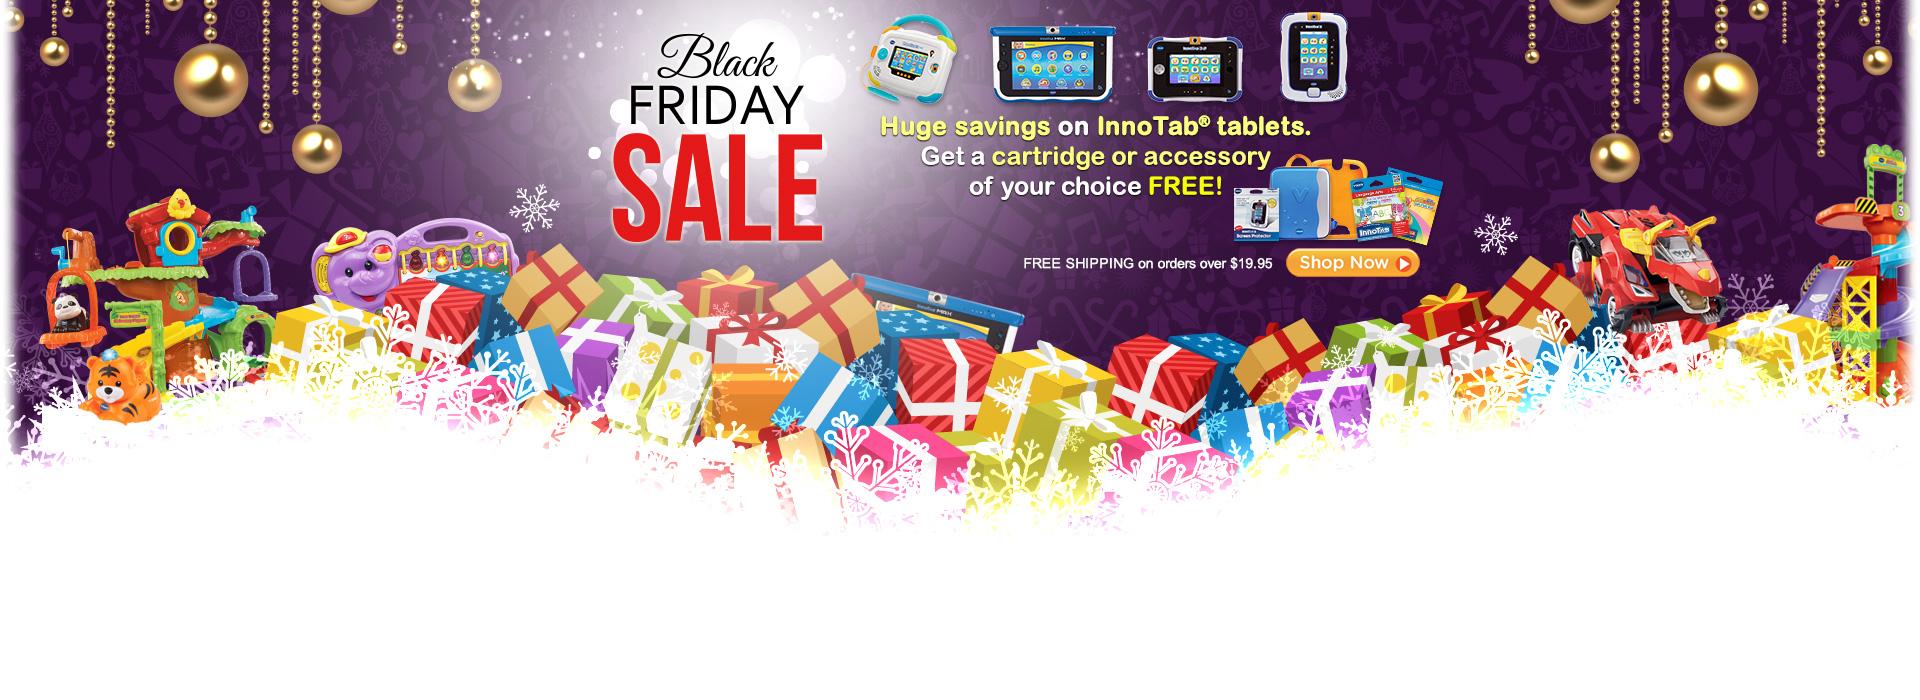 Black Friday Sale - Hung savings on InnoTab tablets.